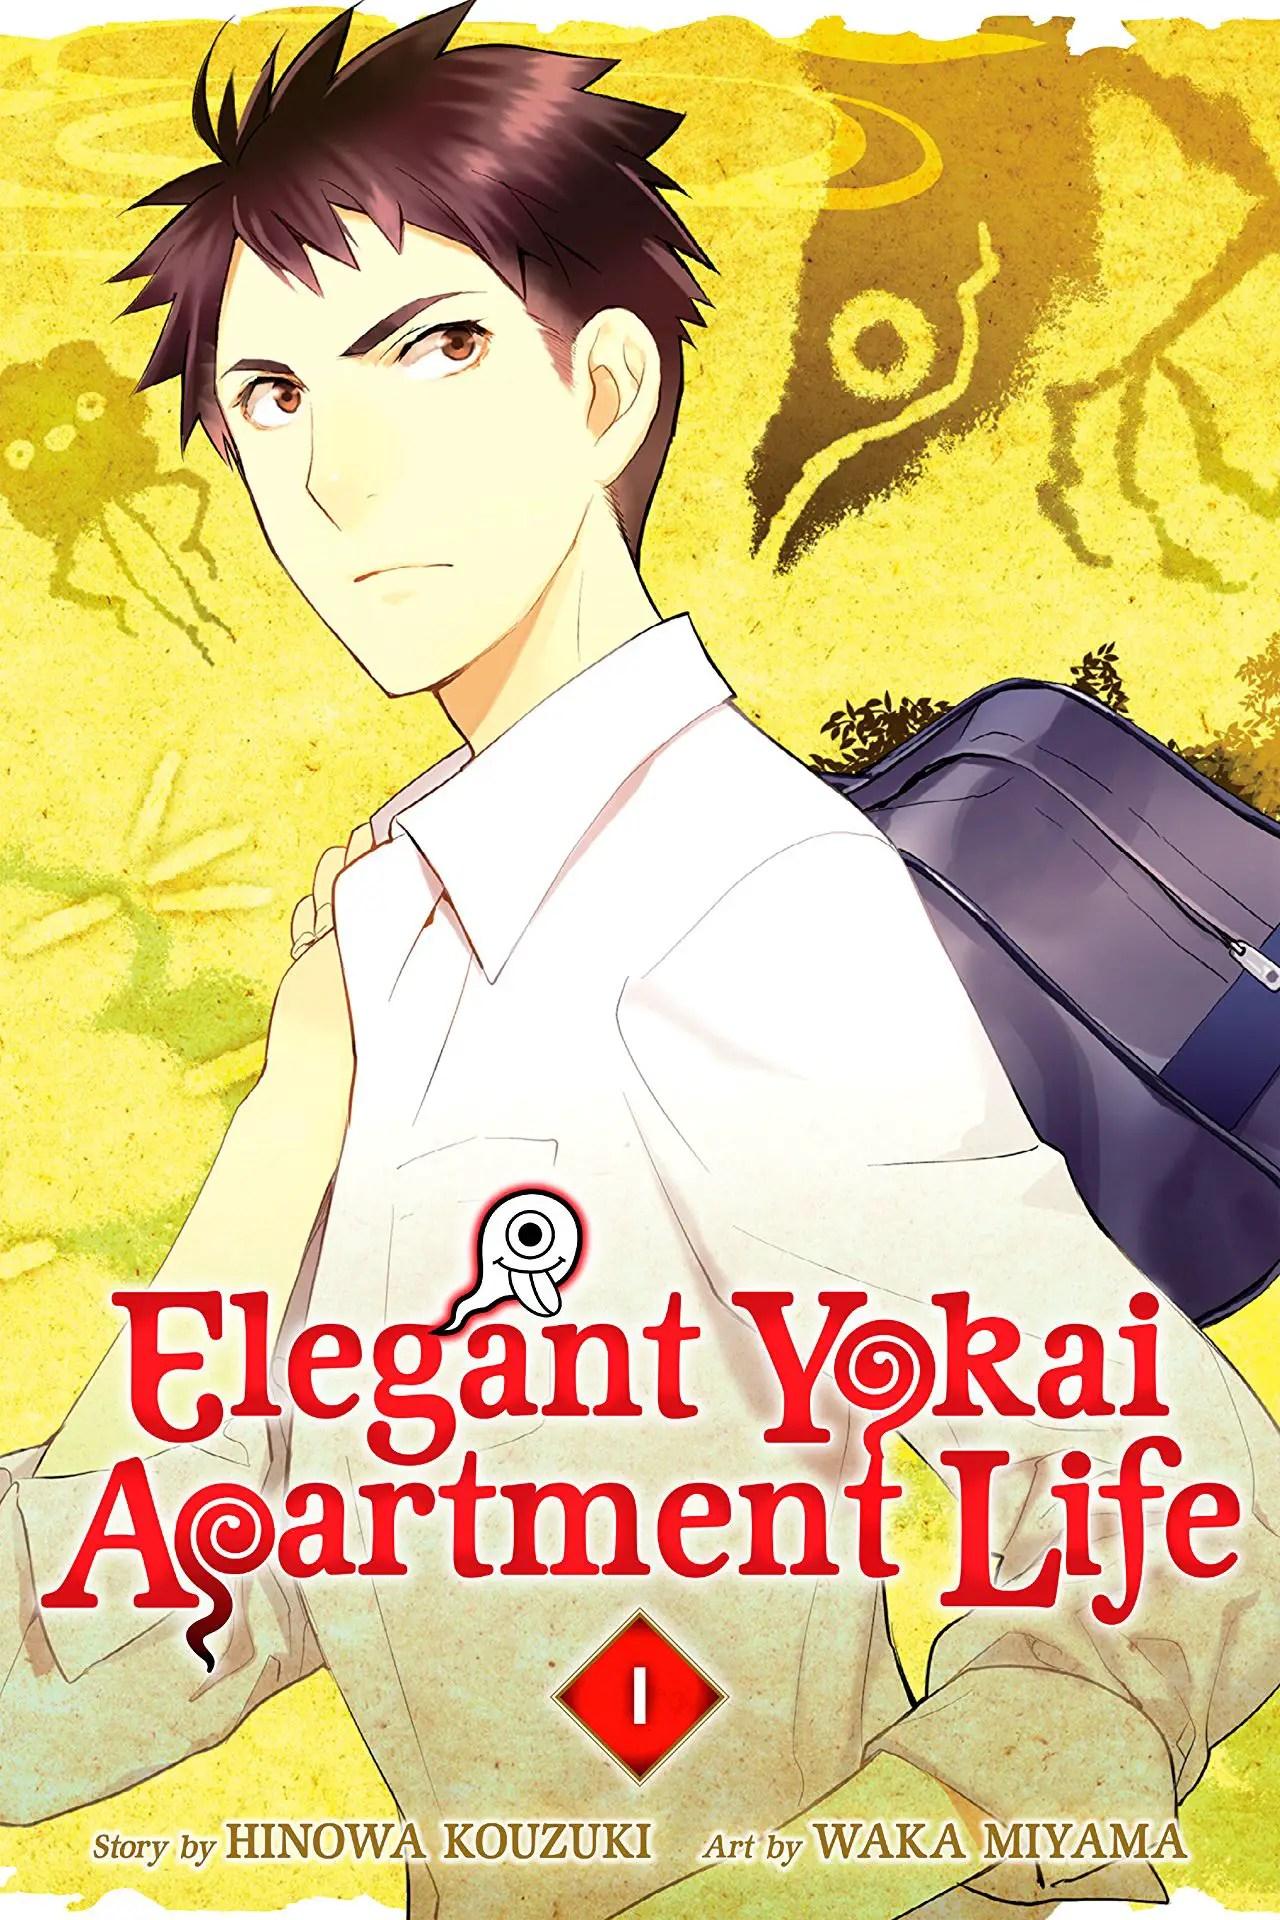 Elegant Yokai Apartment Life Vol. 1 Review